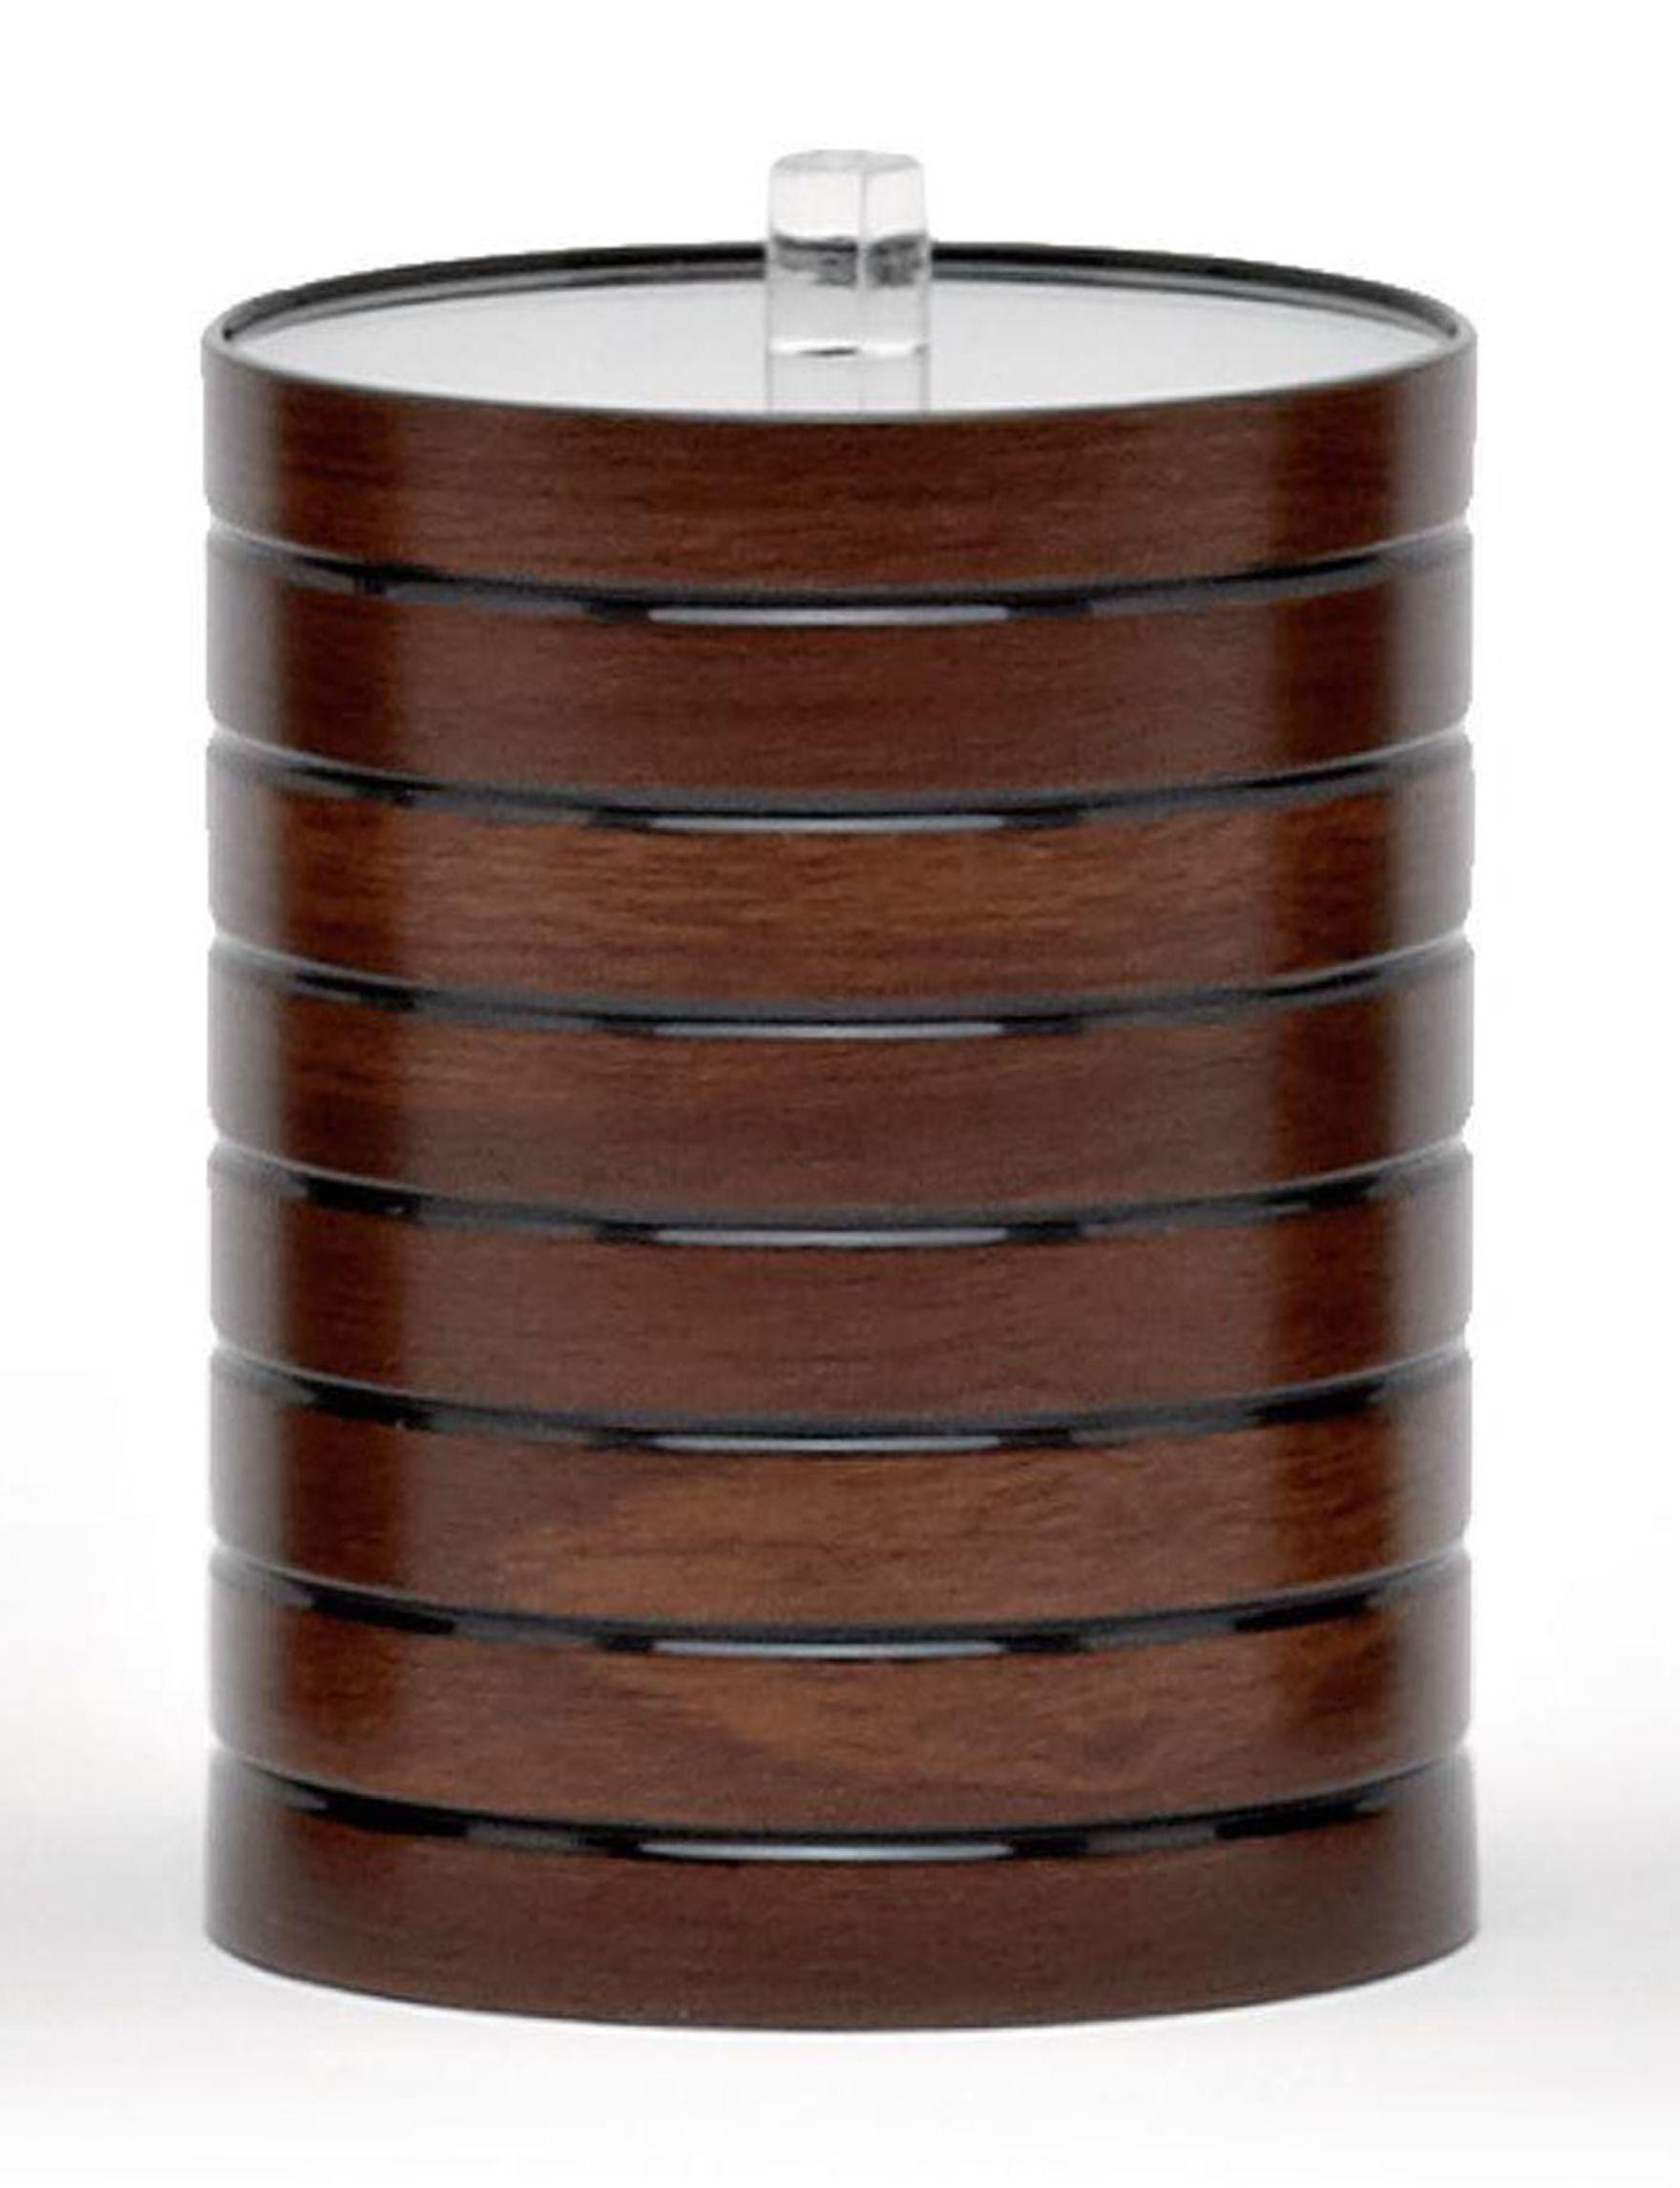 Moda Walnut Trays & Jars Bath Accessories